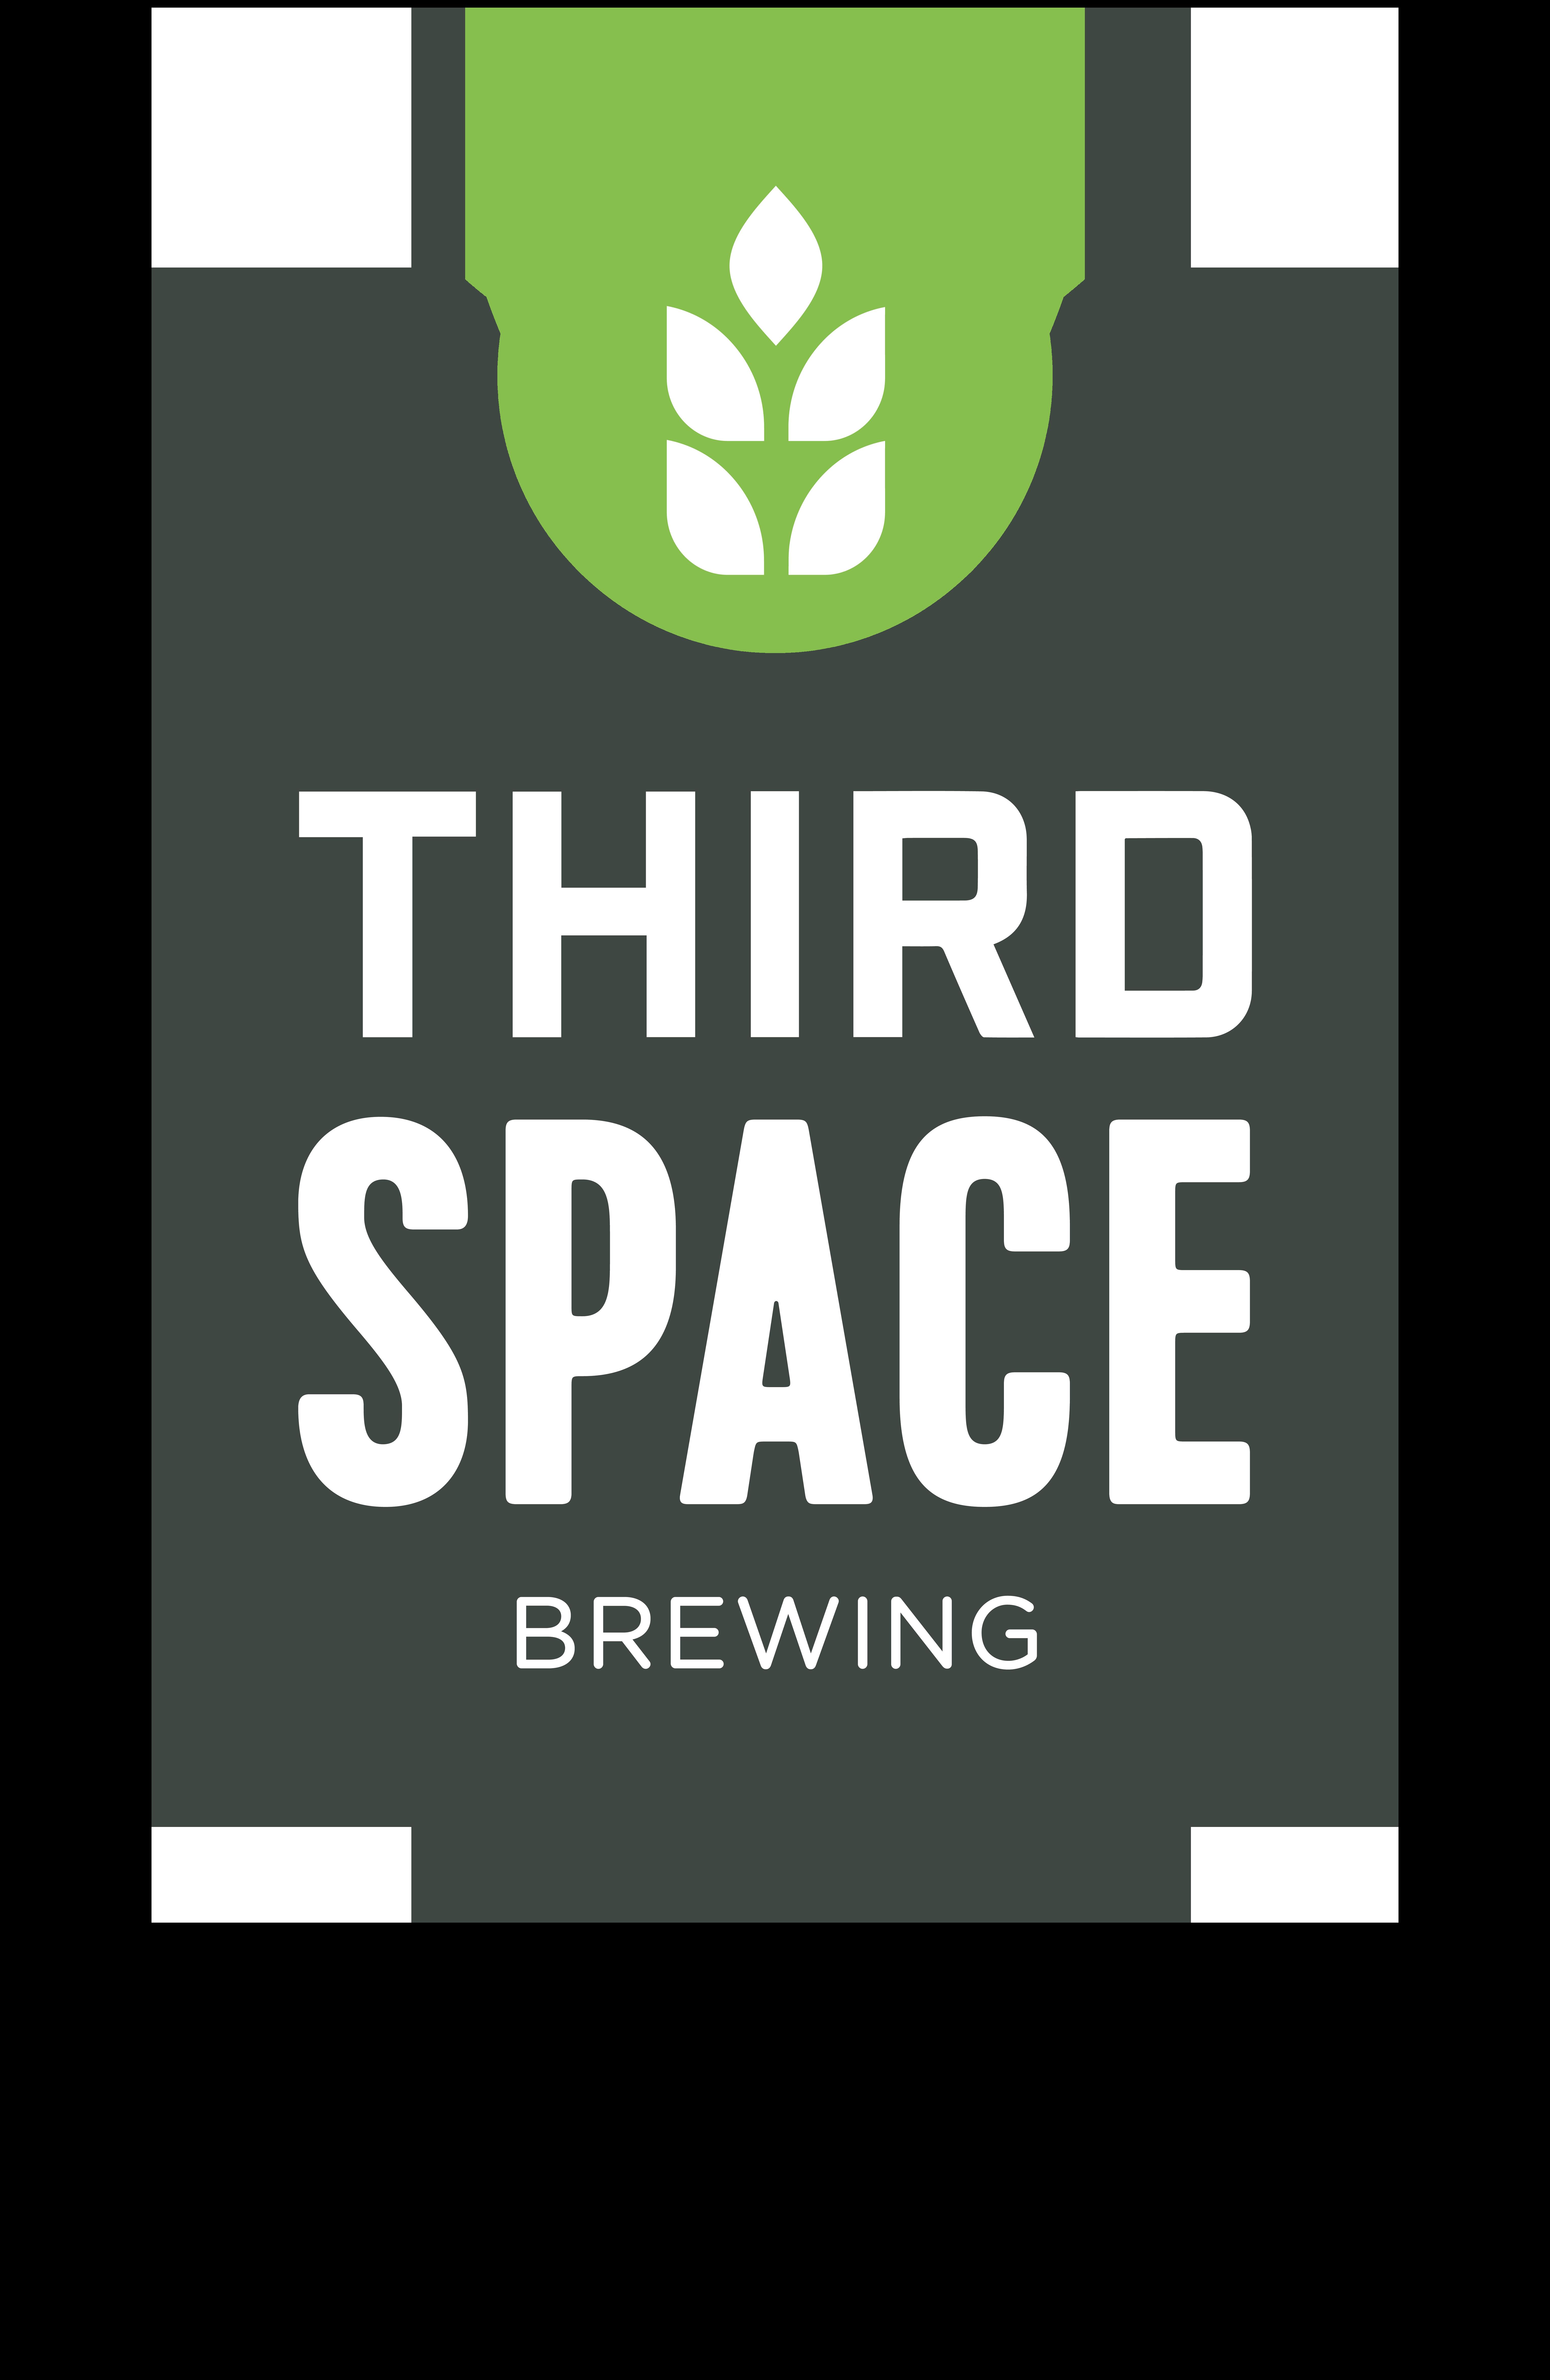 Third Space Brewing